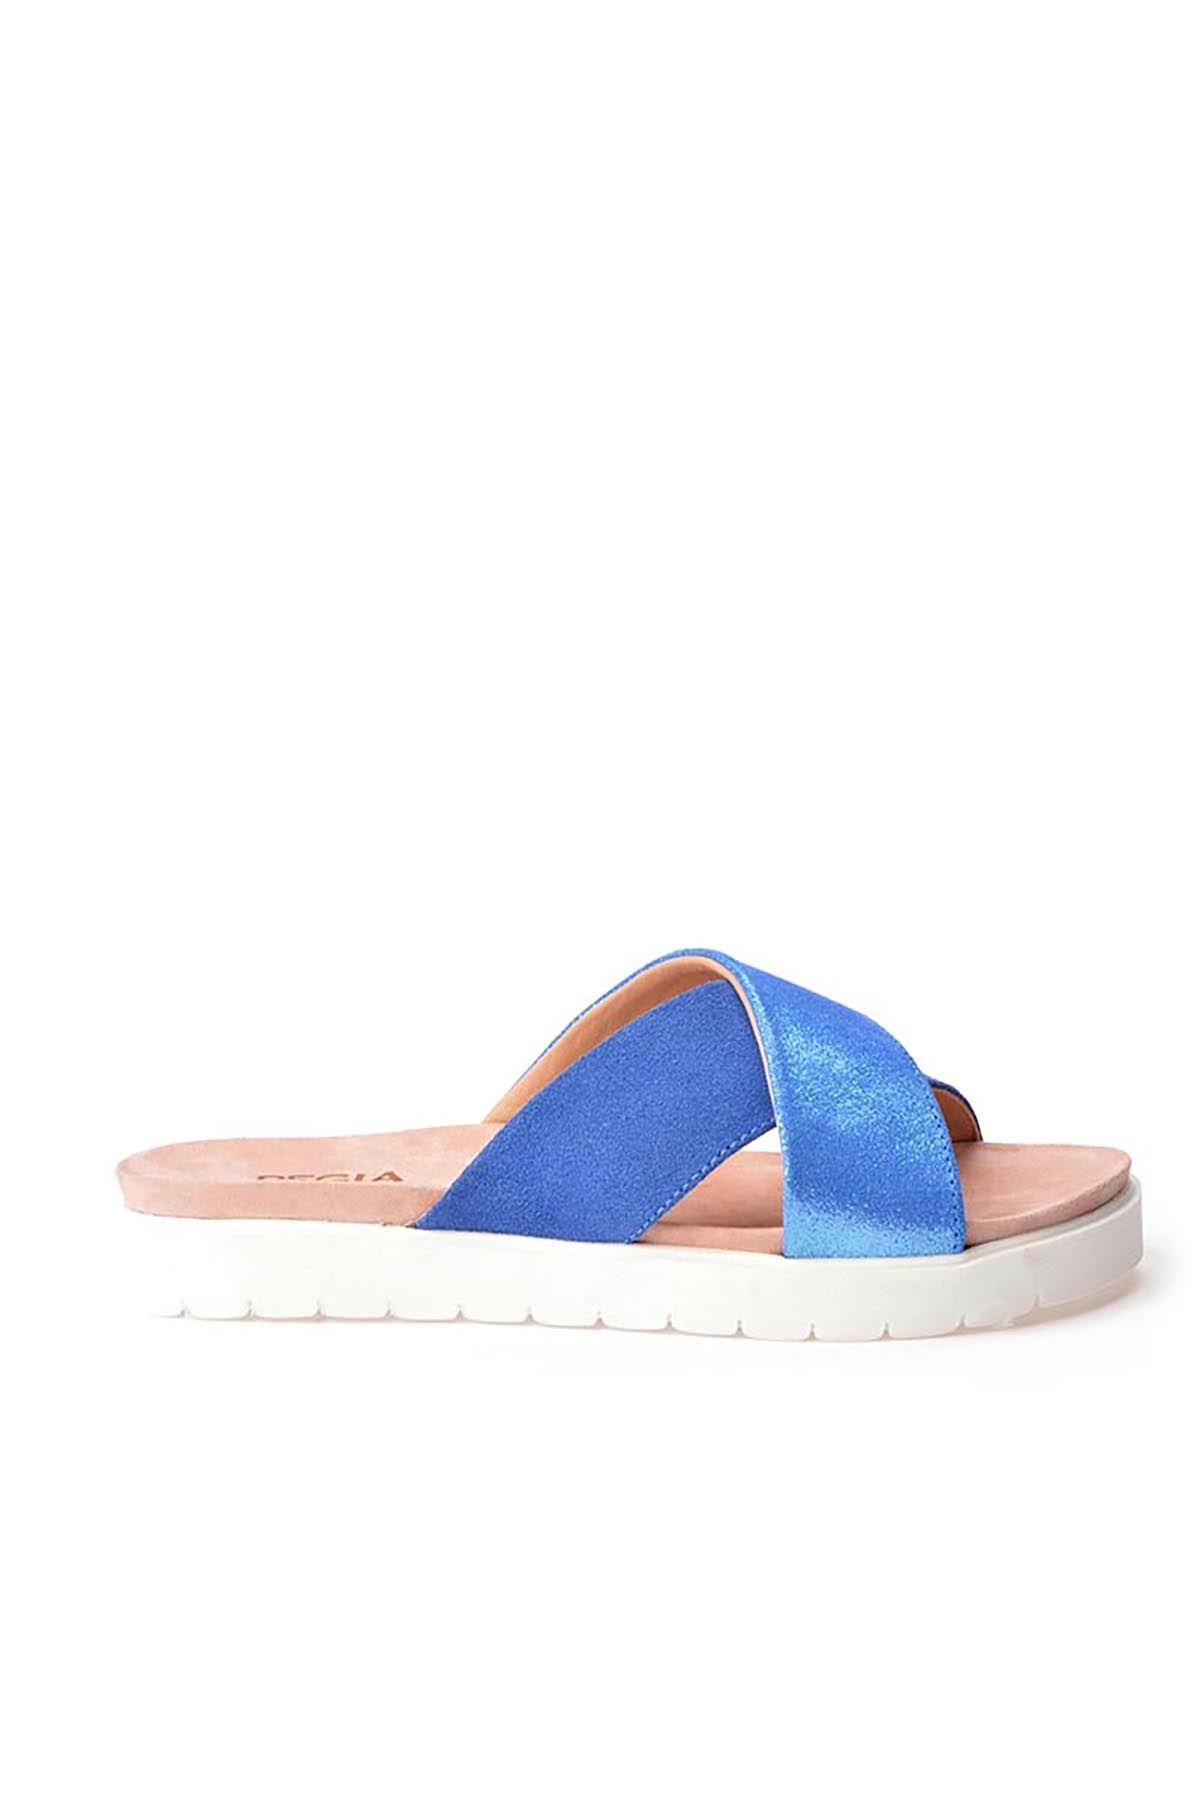 Pegia La Ferme Hakiki Deri Bayan Terlik REC-008 Mavi